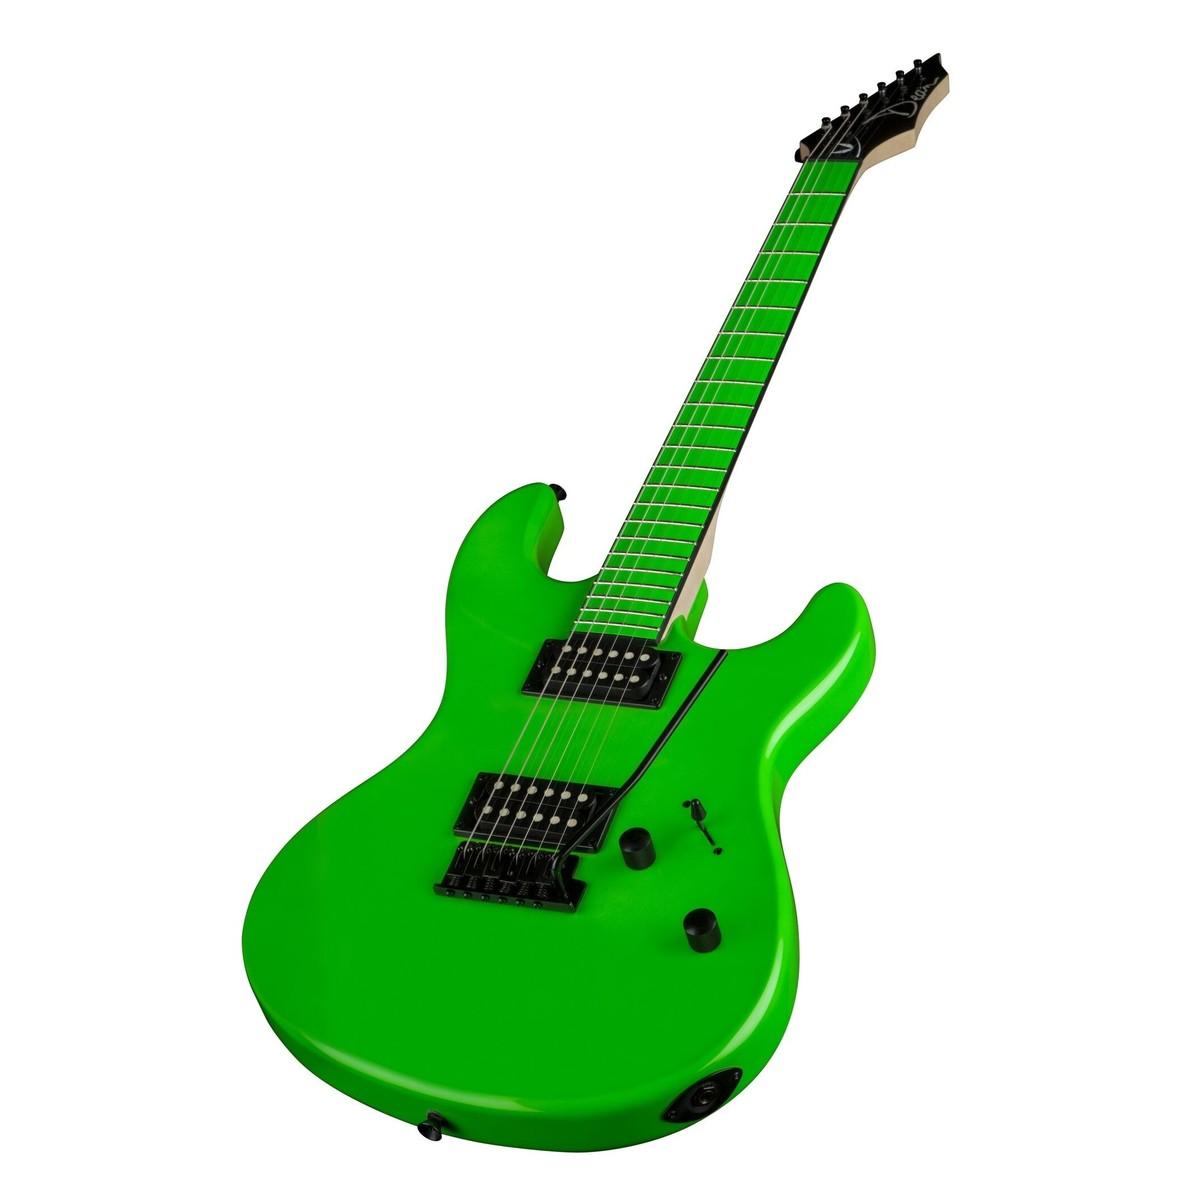 dean custom zone electric guitar neon green at. Black Bedroom Furniture Sets. Home Design Ideas